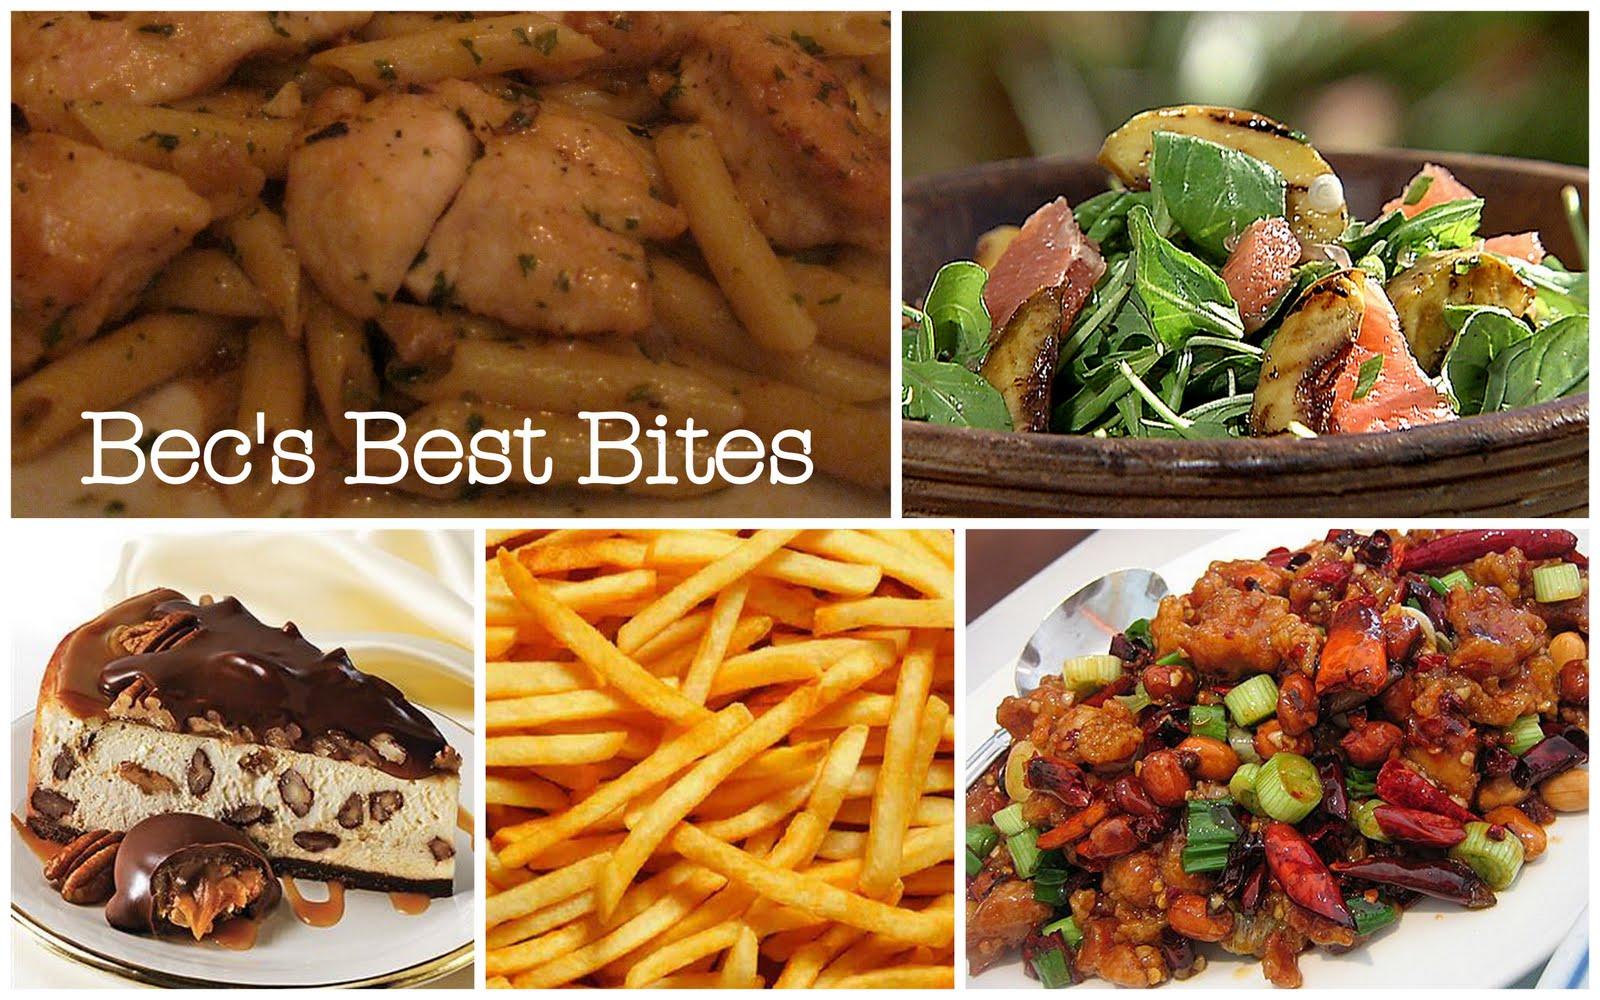 Bec's Best Bites